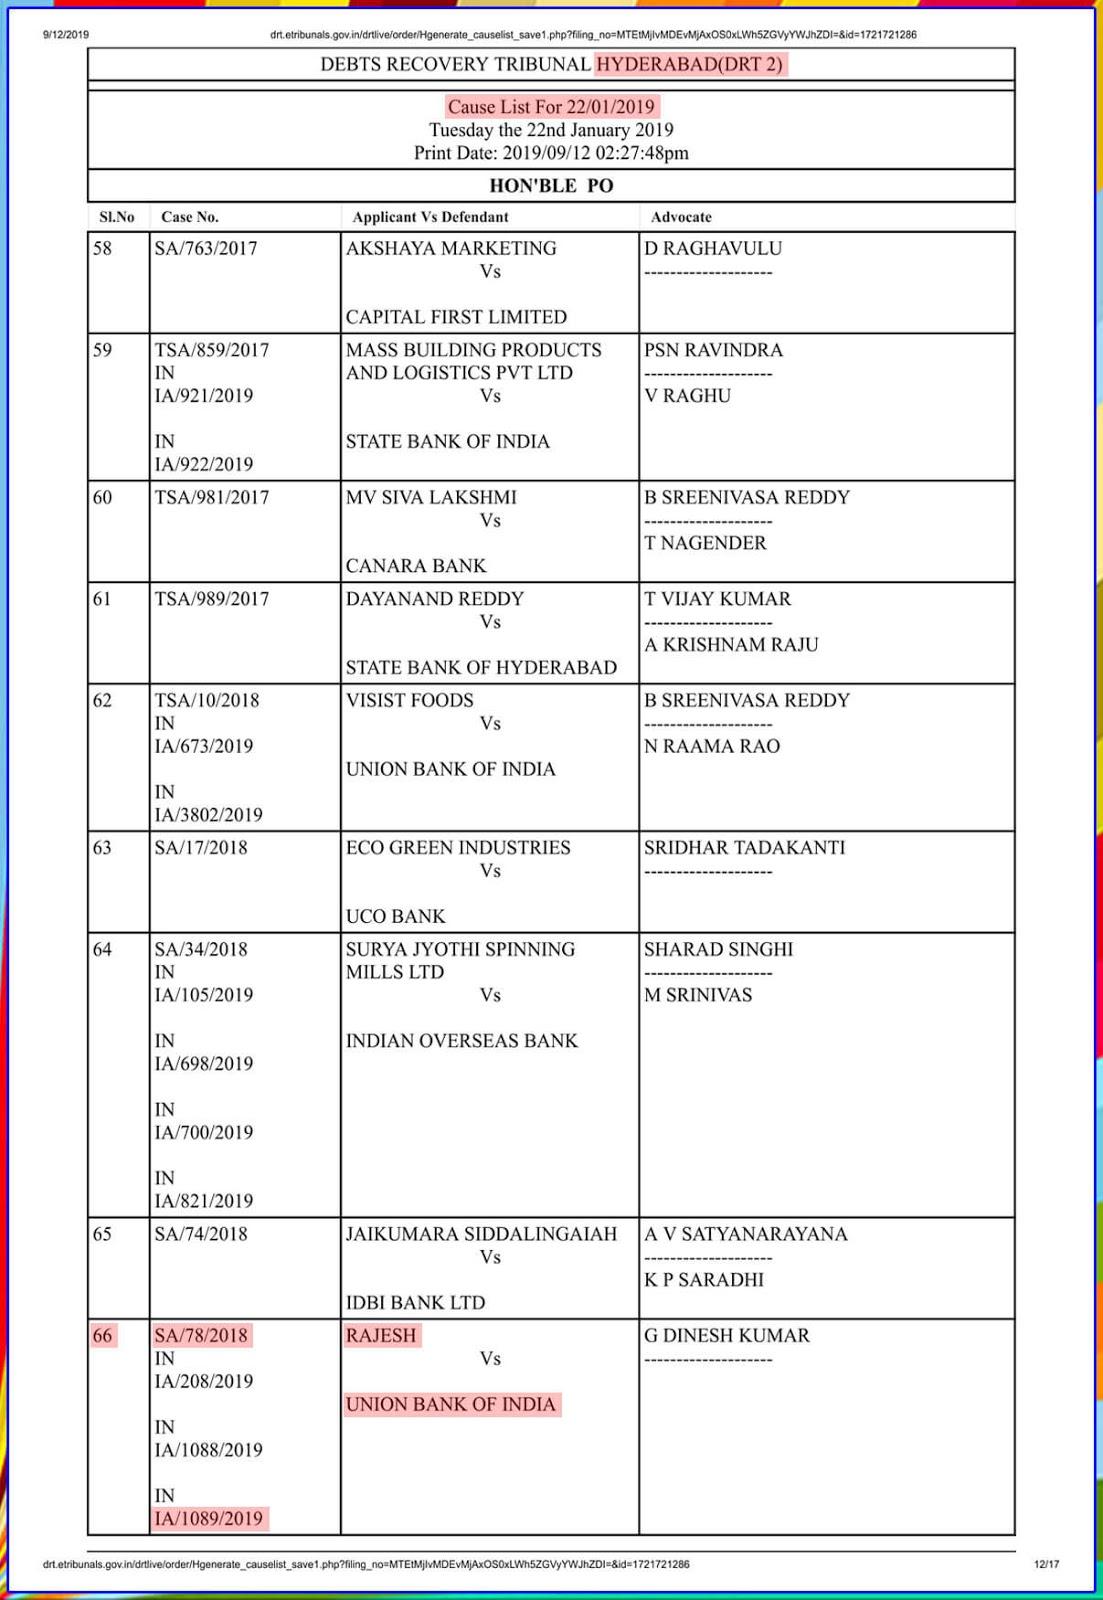 Debit recovery Tribunal-2 Hyderabad-I.A.No.1089/2019-11